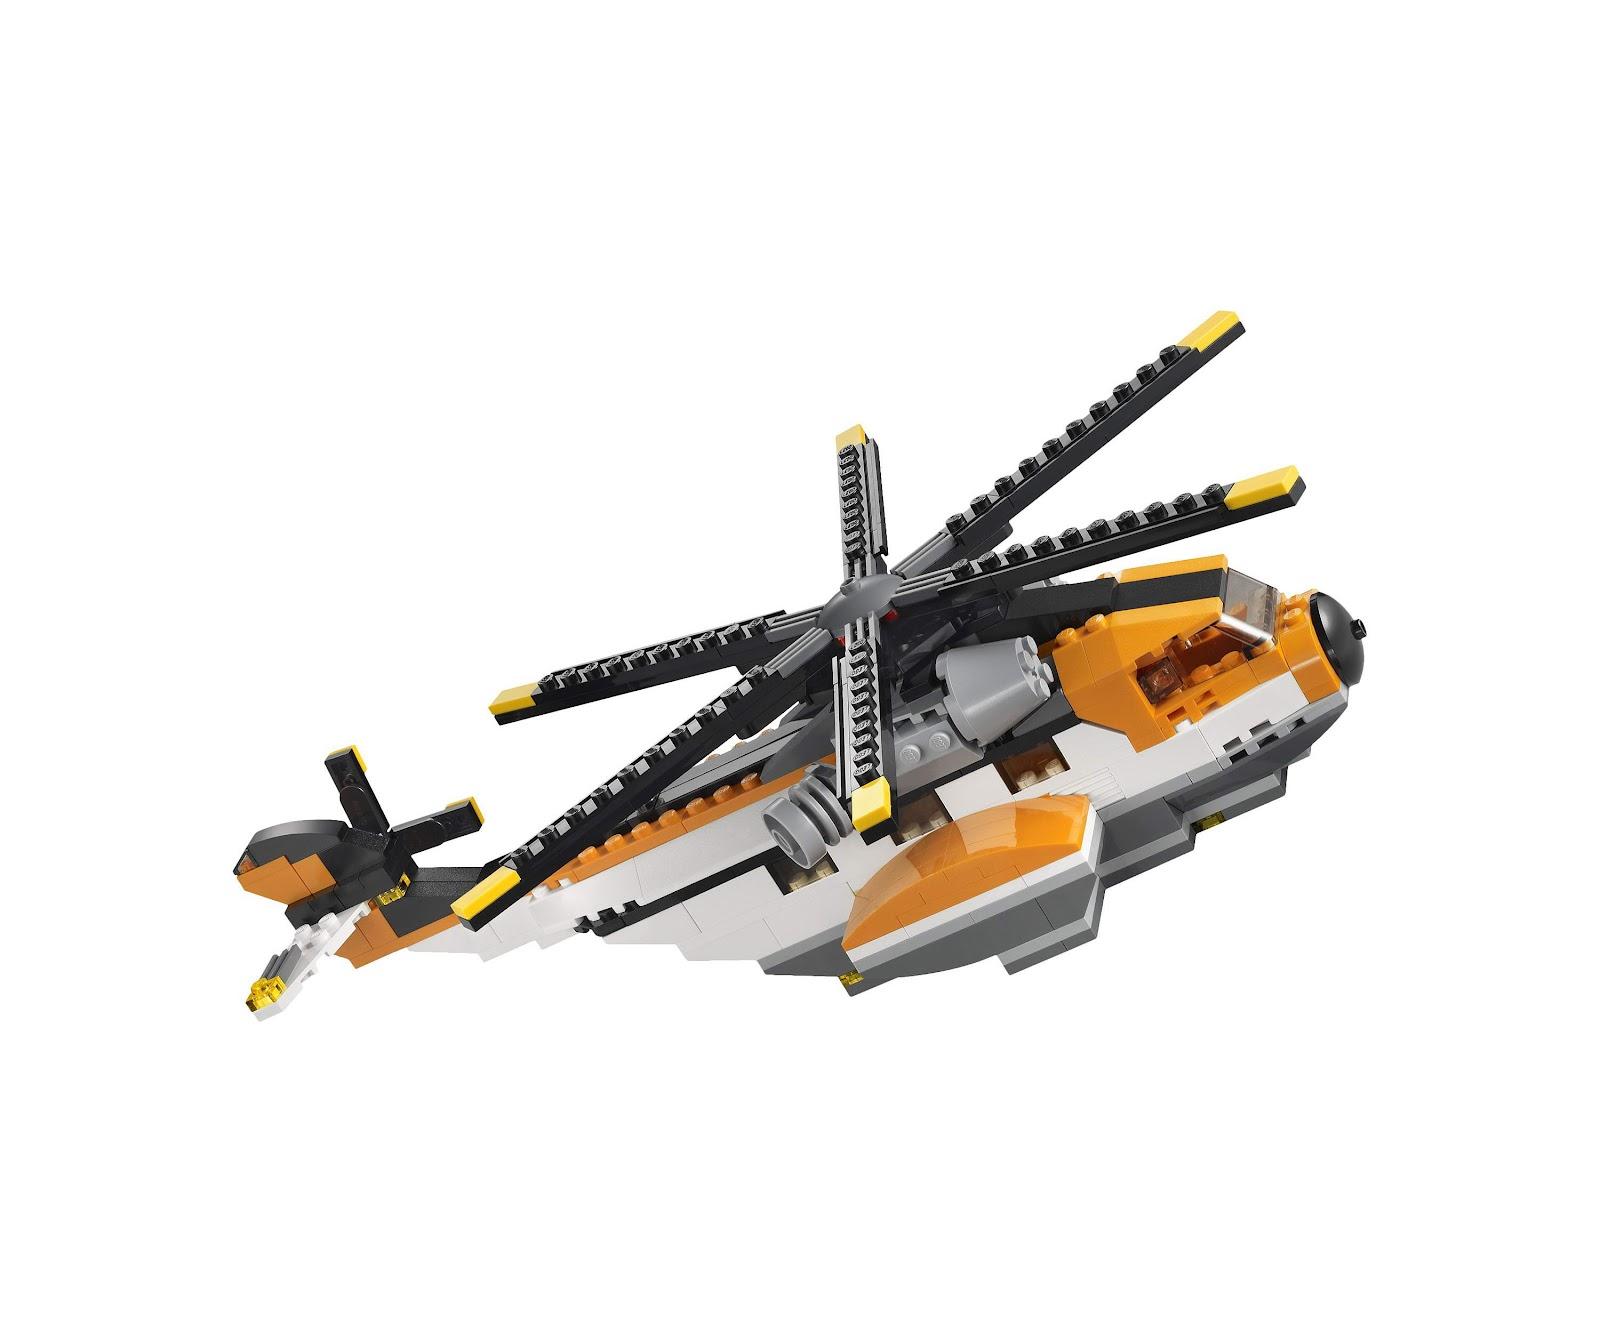 Lego 7345 Creator Transport Chopper I Brick City